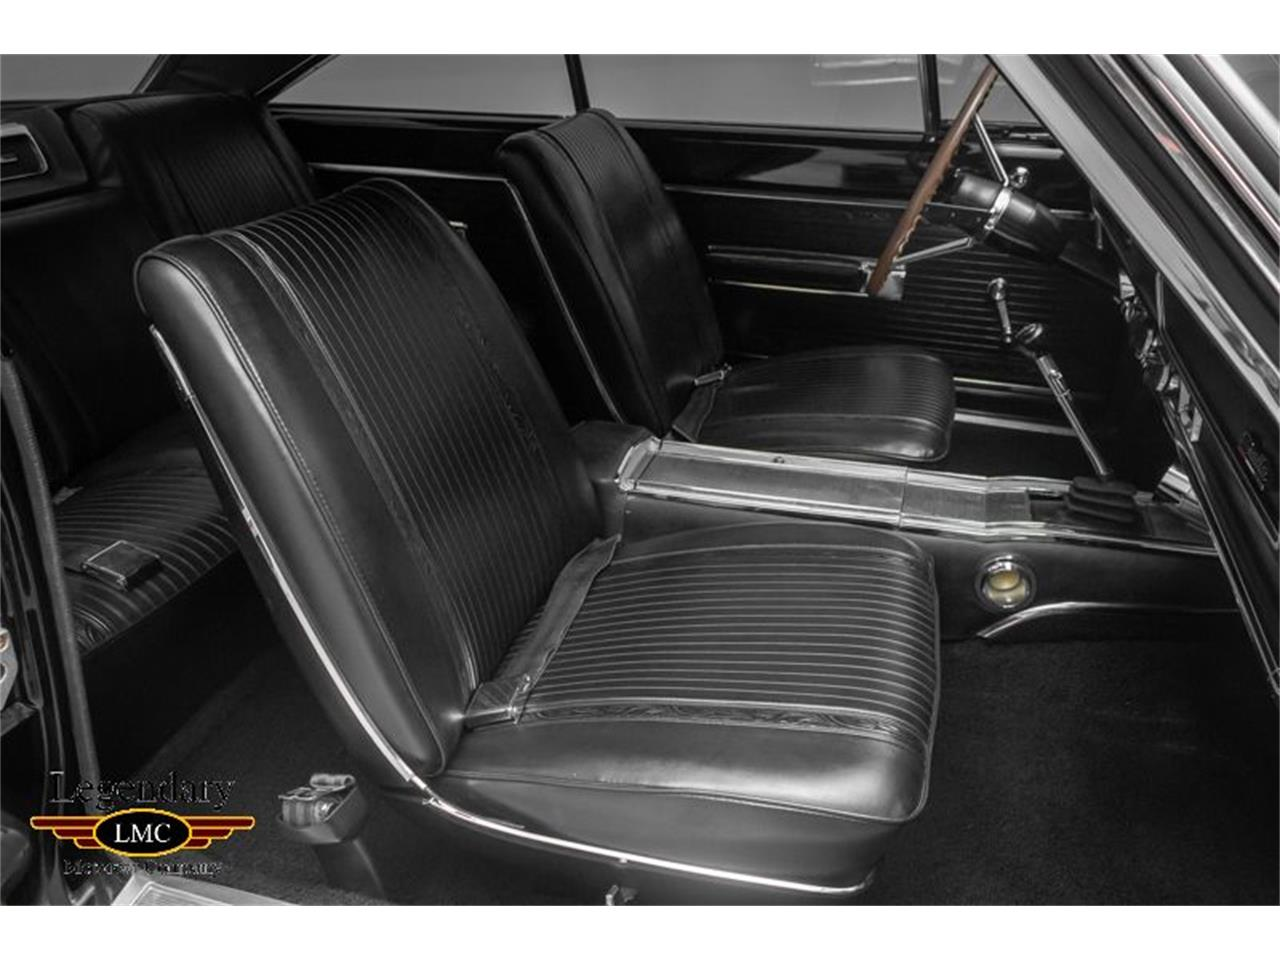 1966 Plymouth Satellite (CC-1265884) for sale in Halton Hills, Ontario